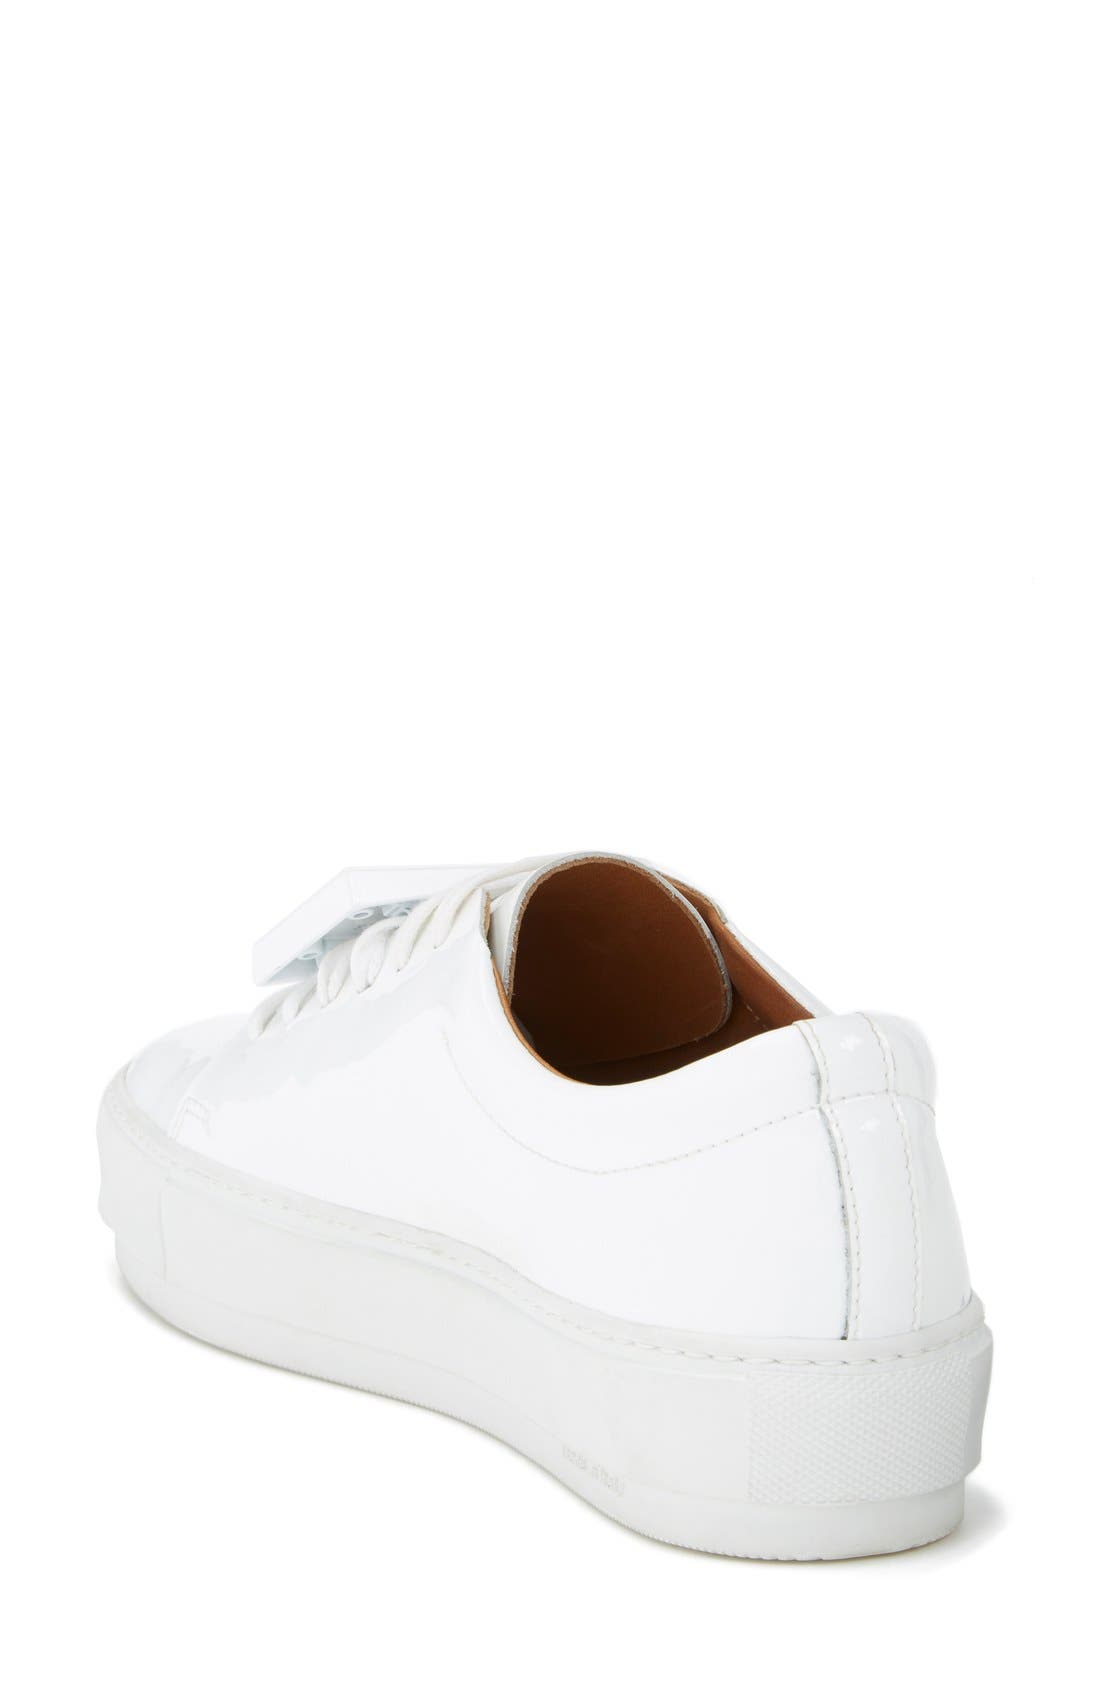 Alternate Image 2  - Acne Studios Adriana Leather Sneaker (Women)